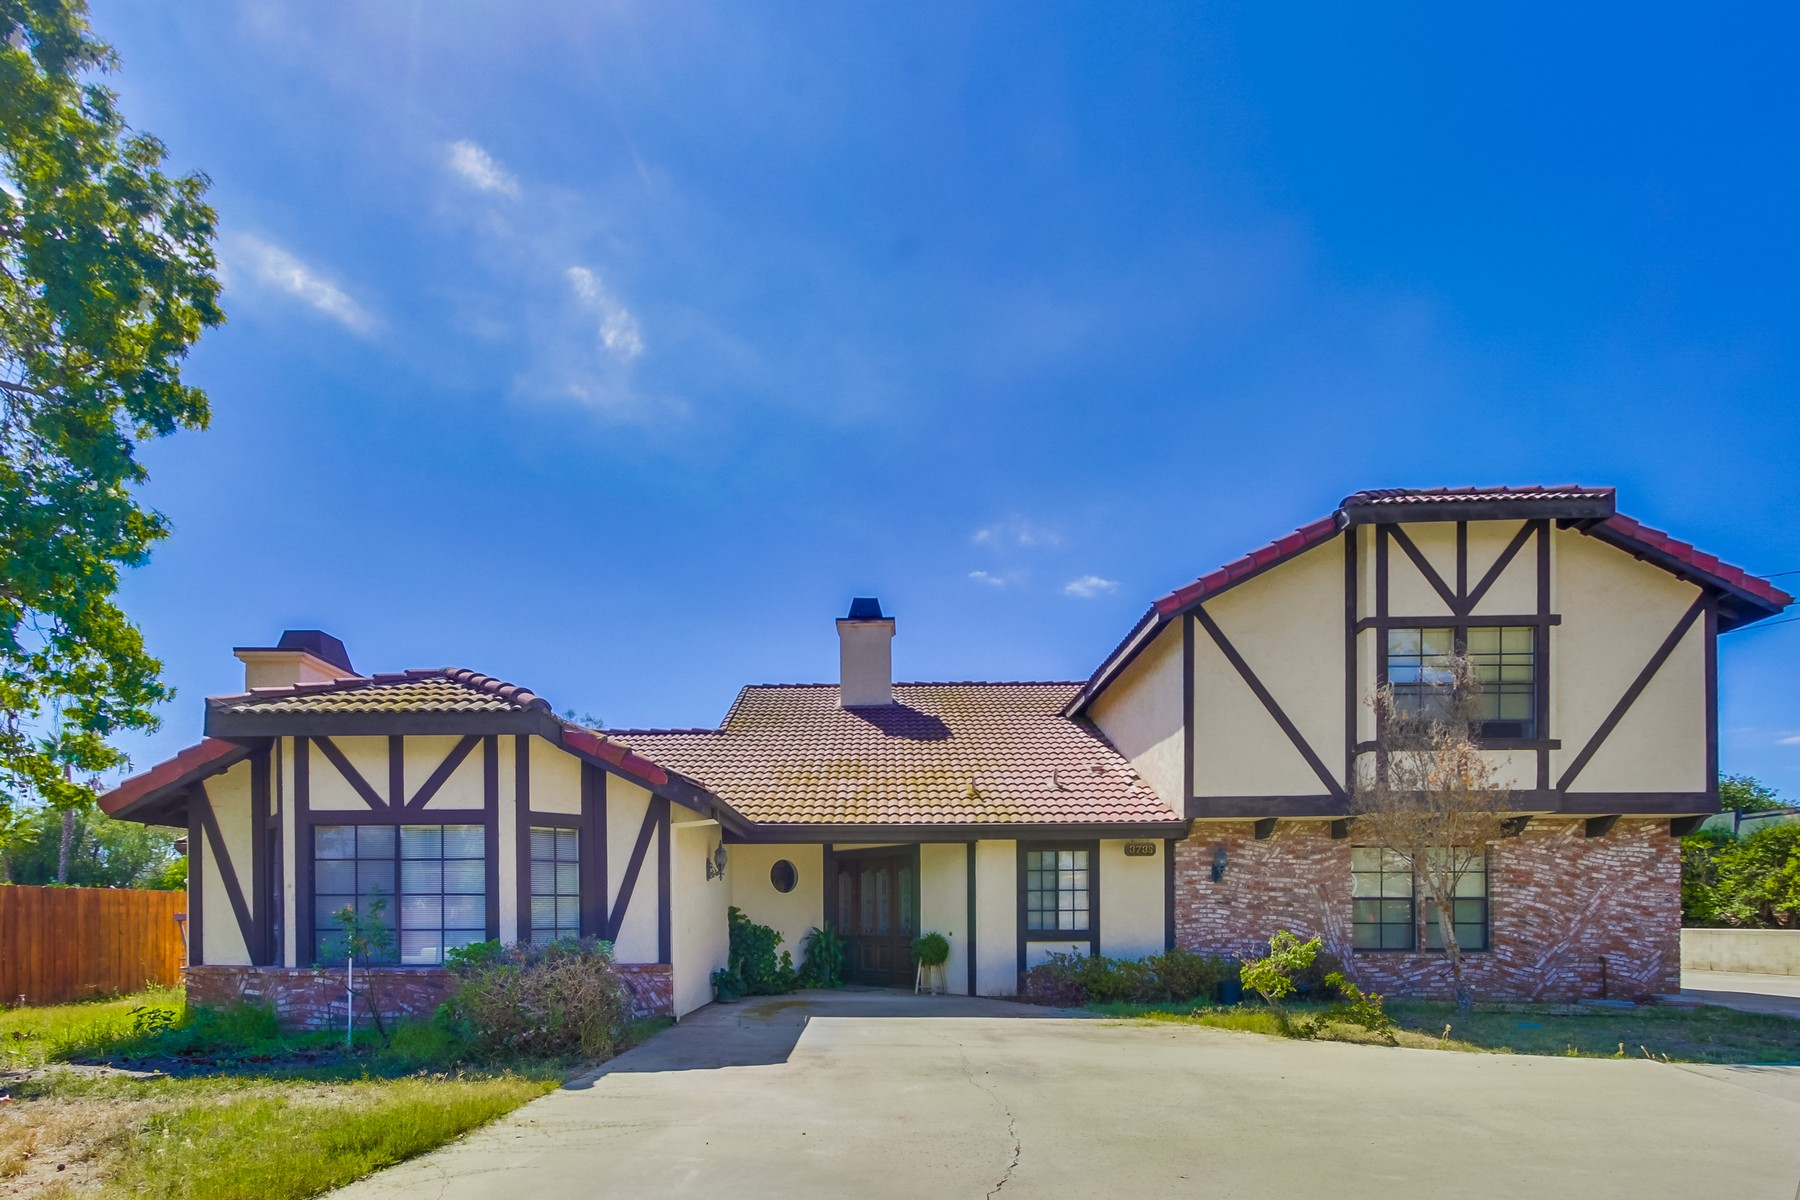 Property For Sale at 3738 Cresta Bonita